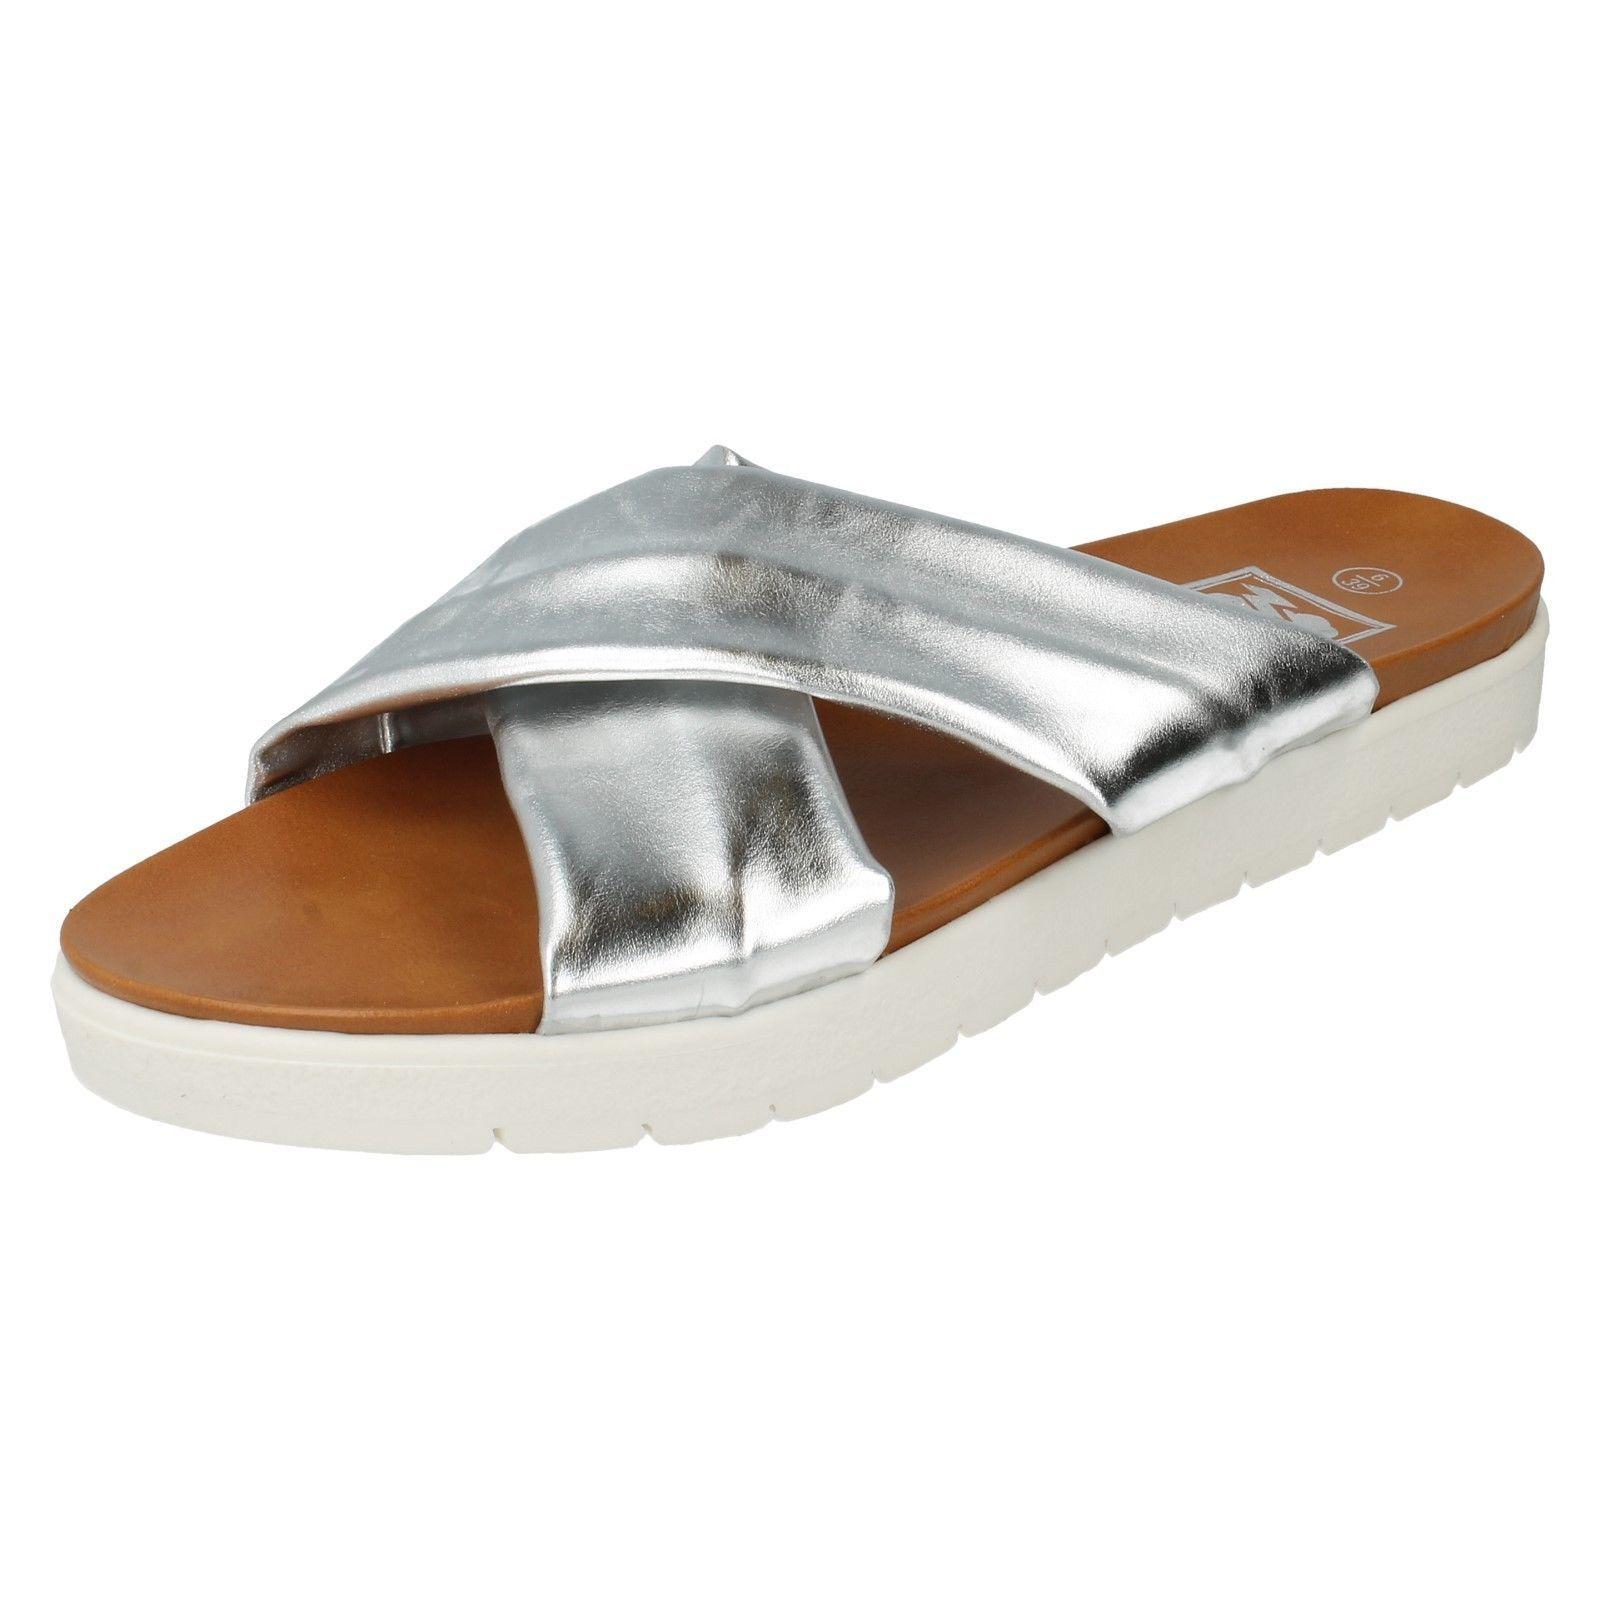 SALE Ladies Down To Earth F10397 Ladies SALE Silver Metallic Synthetic Slip On Mule Sandals 0b43bd